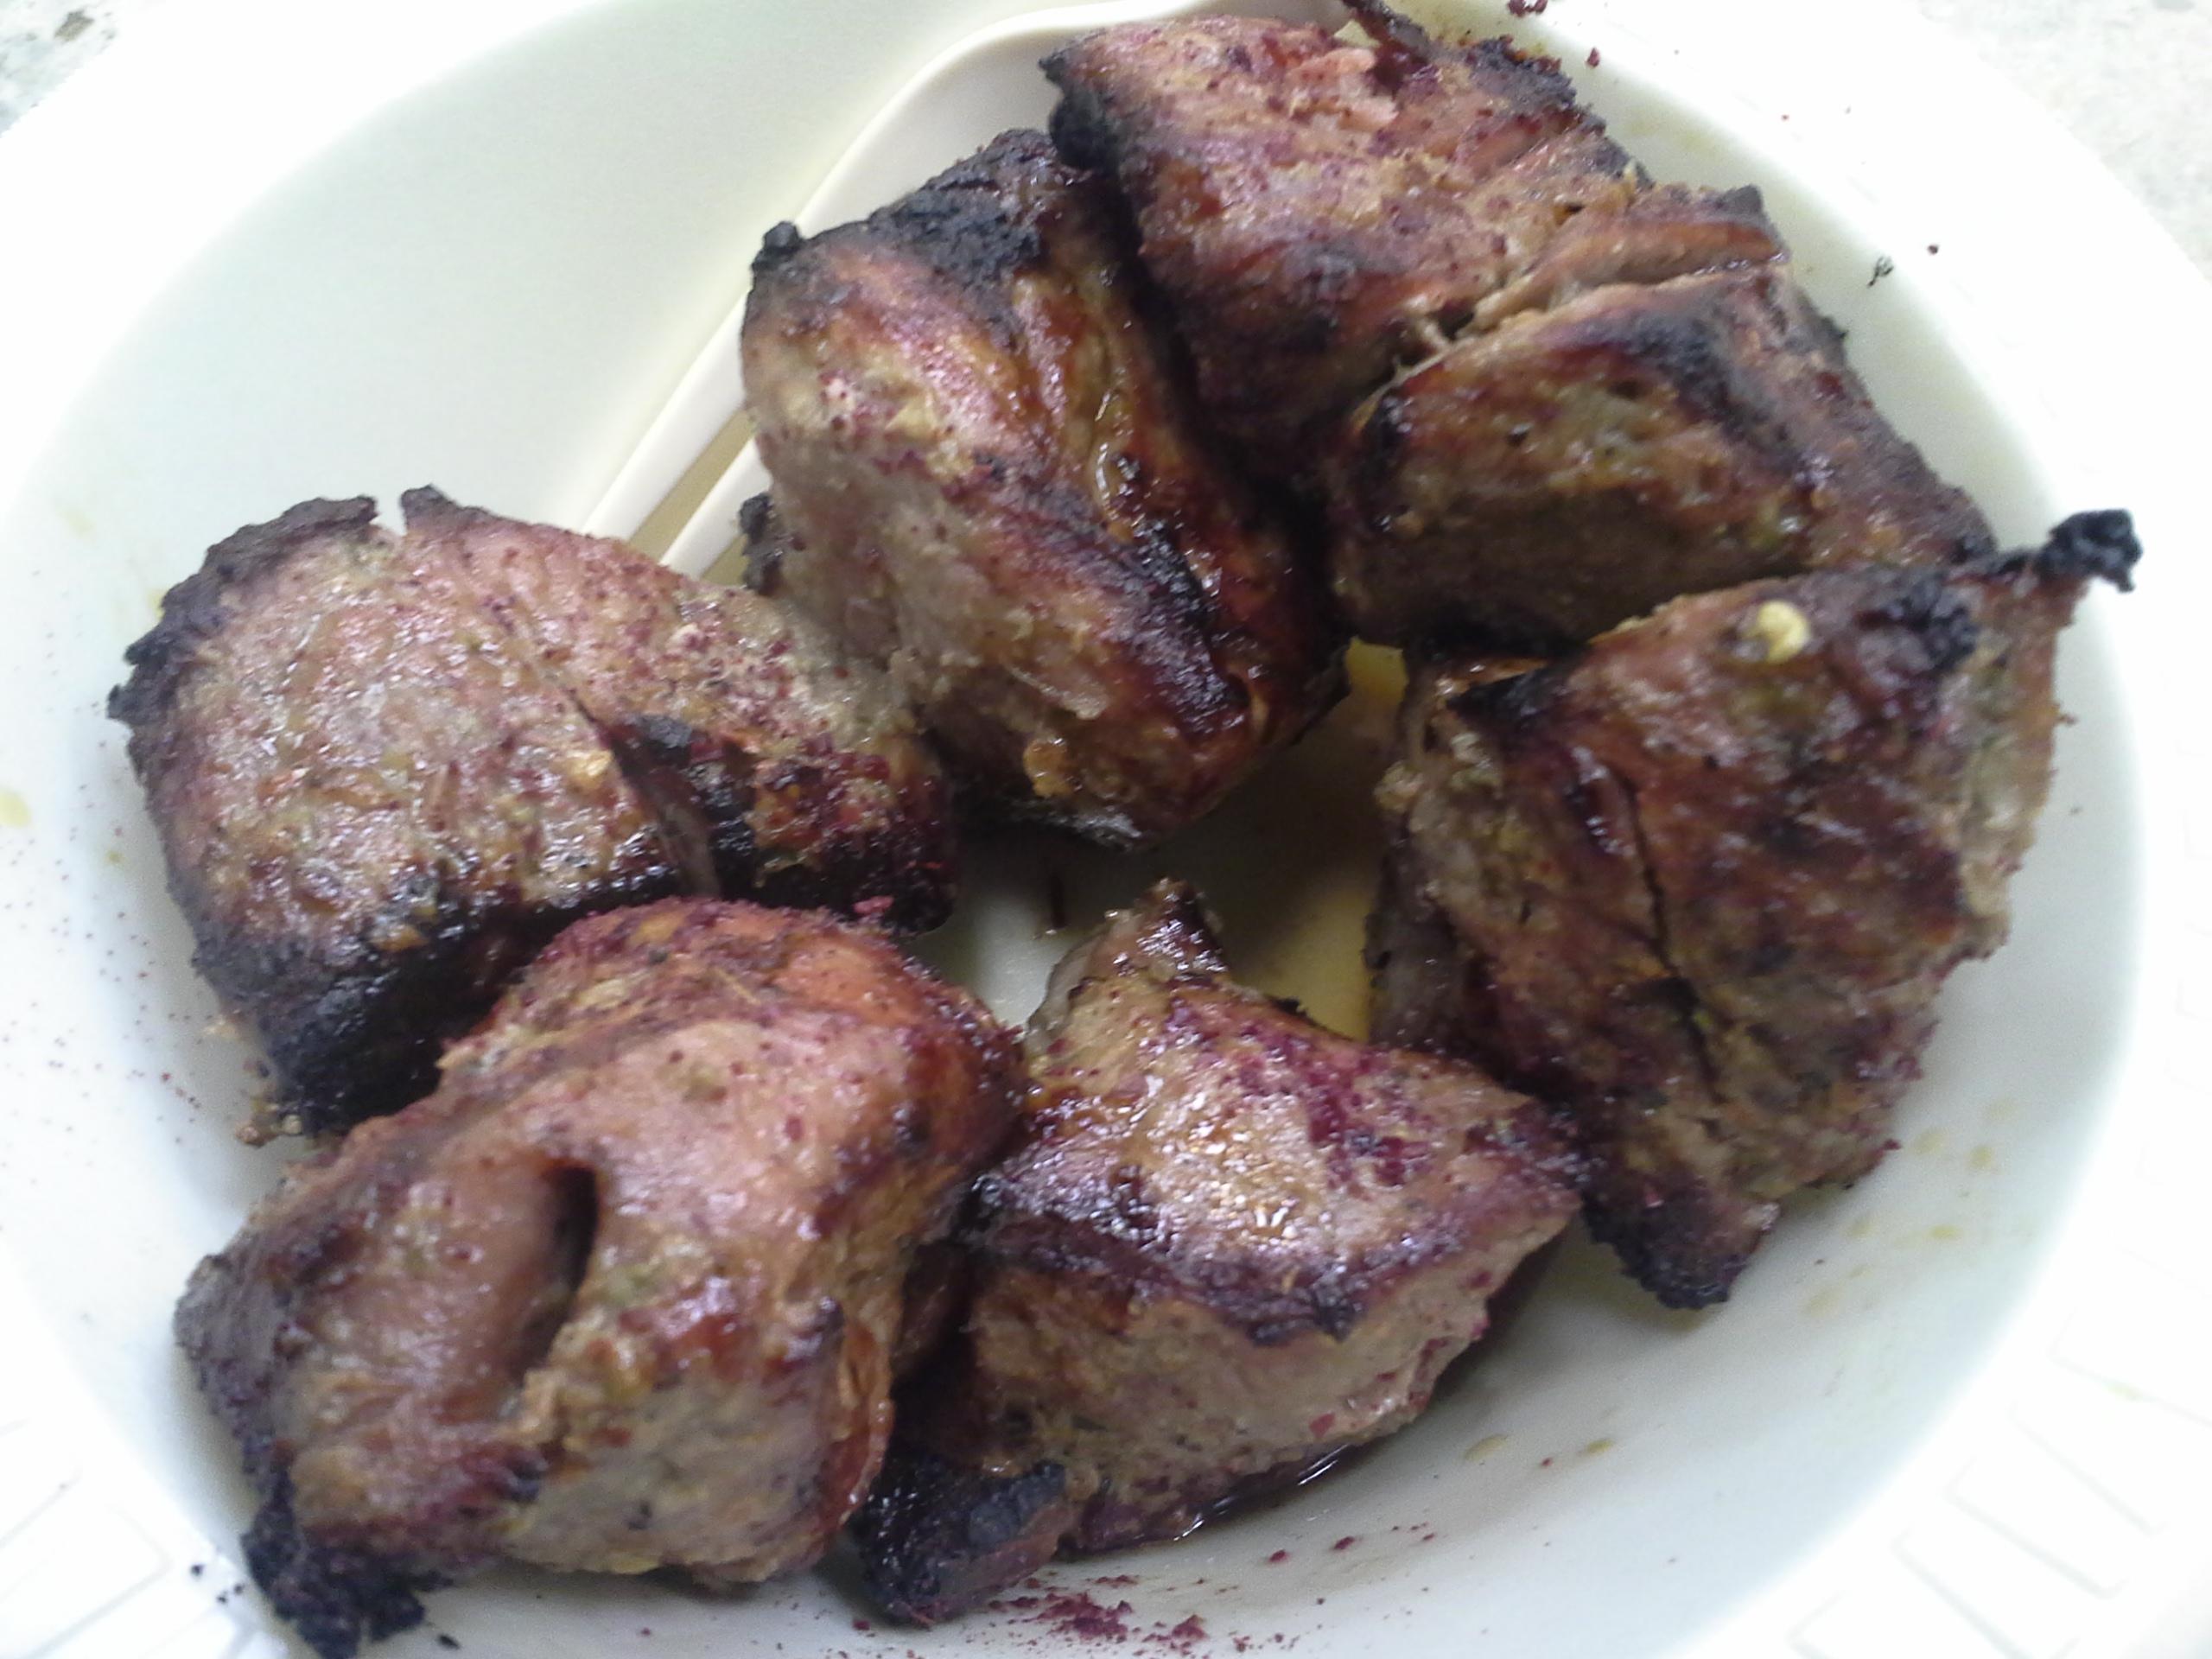 Dinner: 11:05 p.m. | Lamb kabob